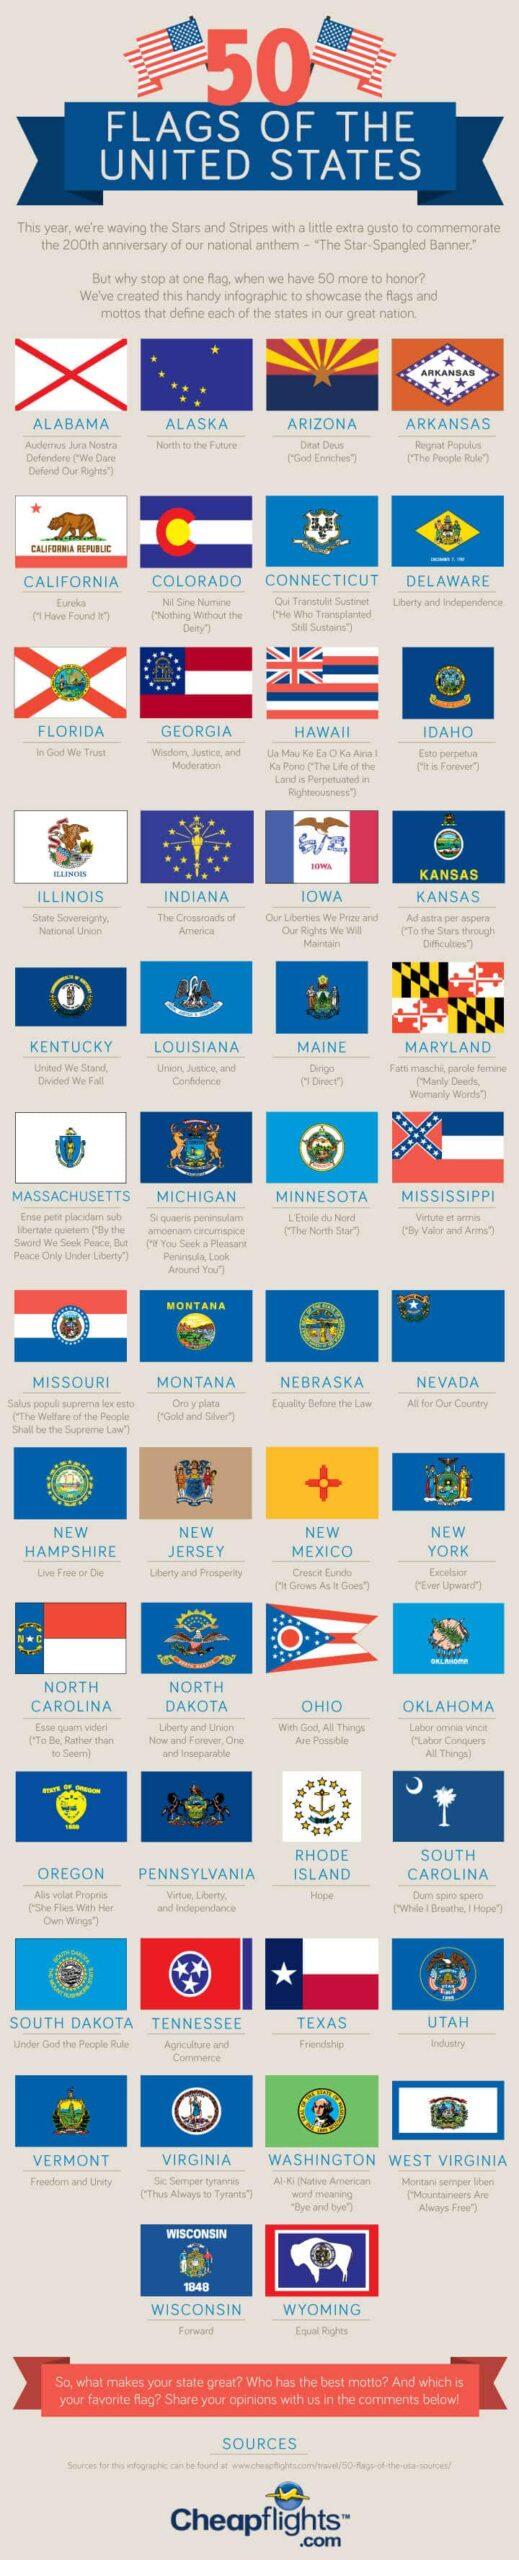 Les états Des états-unis : états, états-unis, Drapeaux, États, Etats-Unis